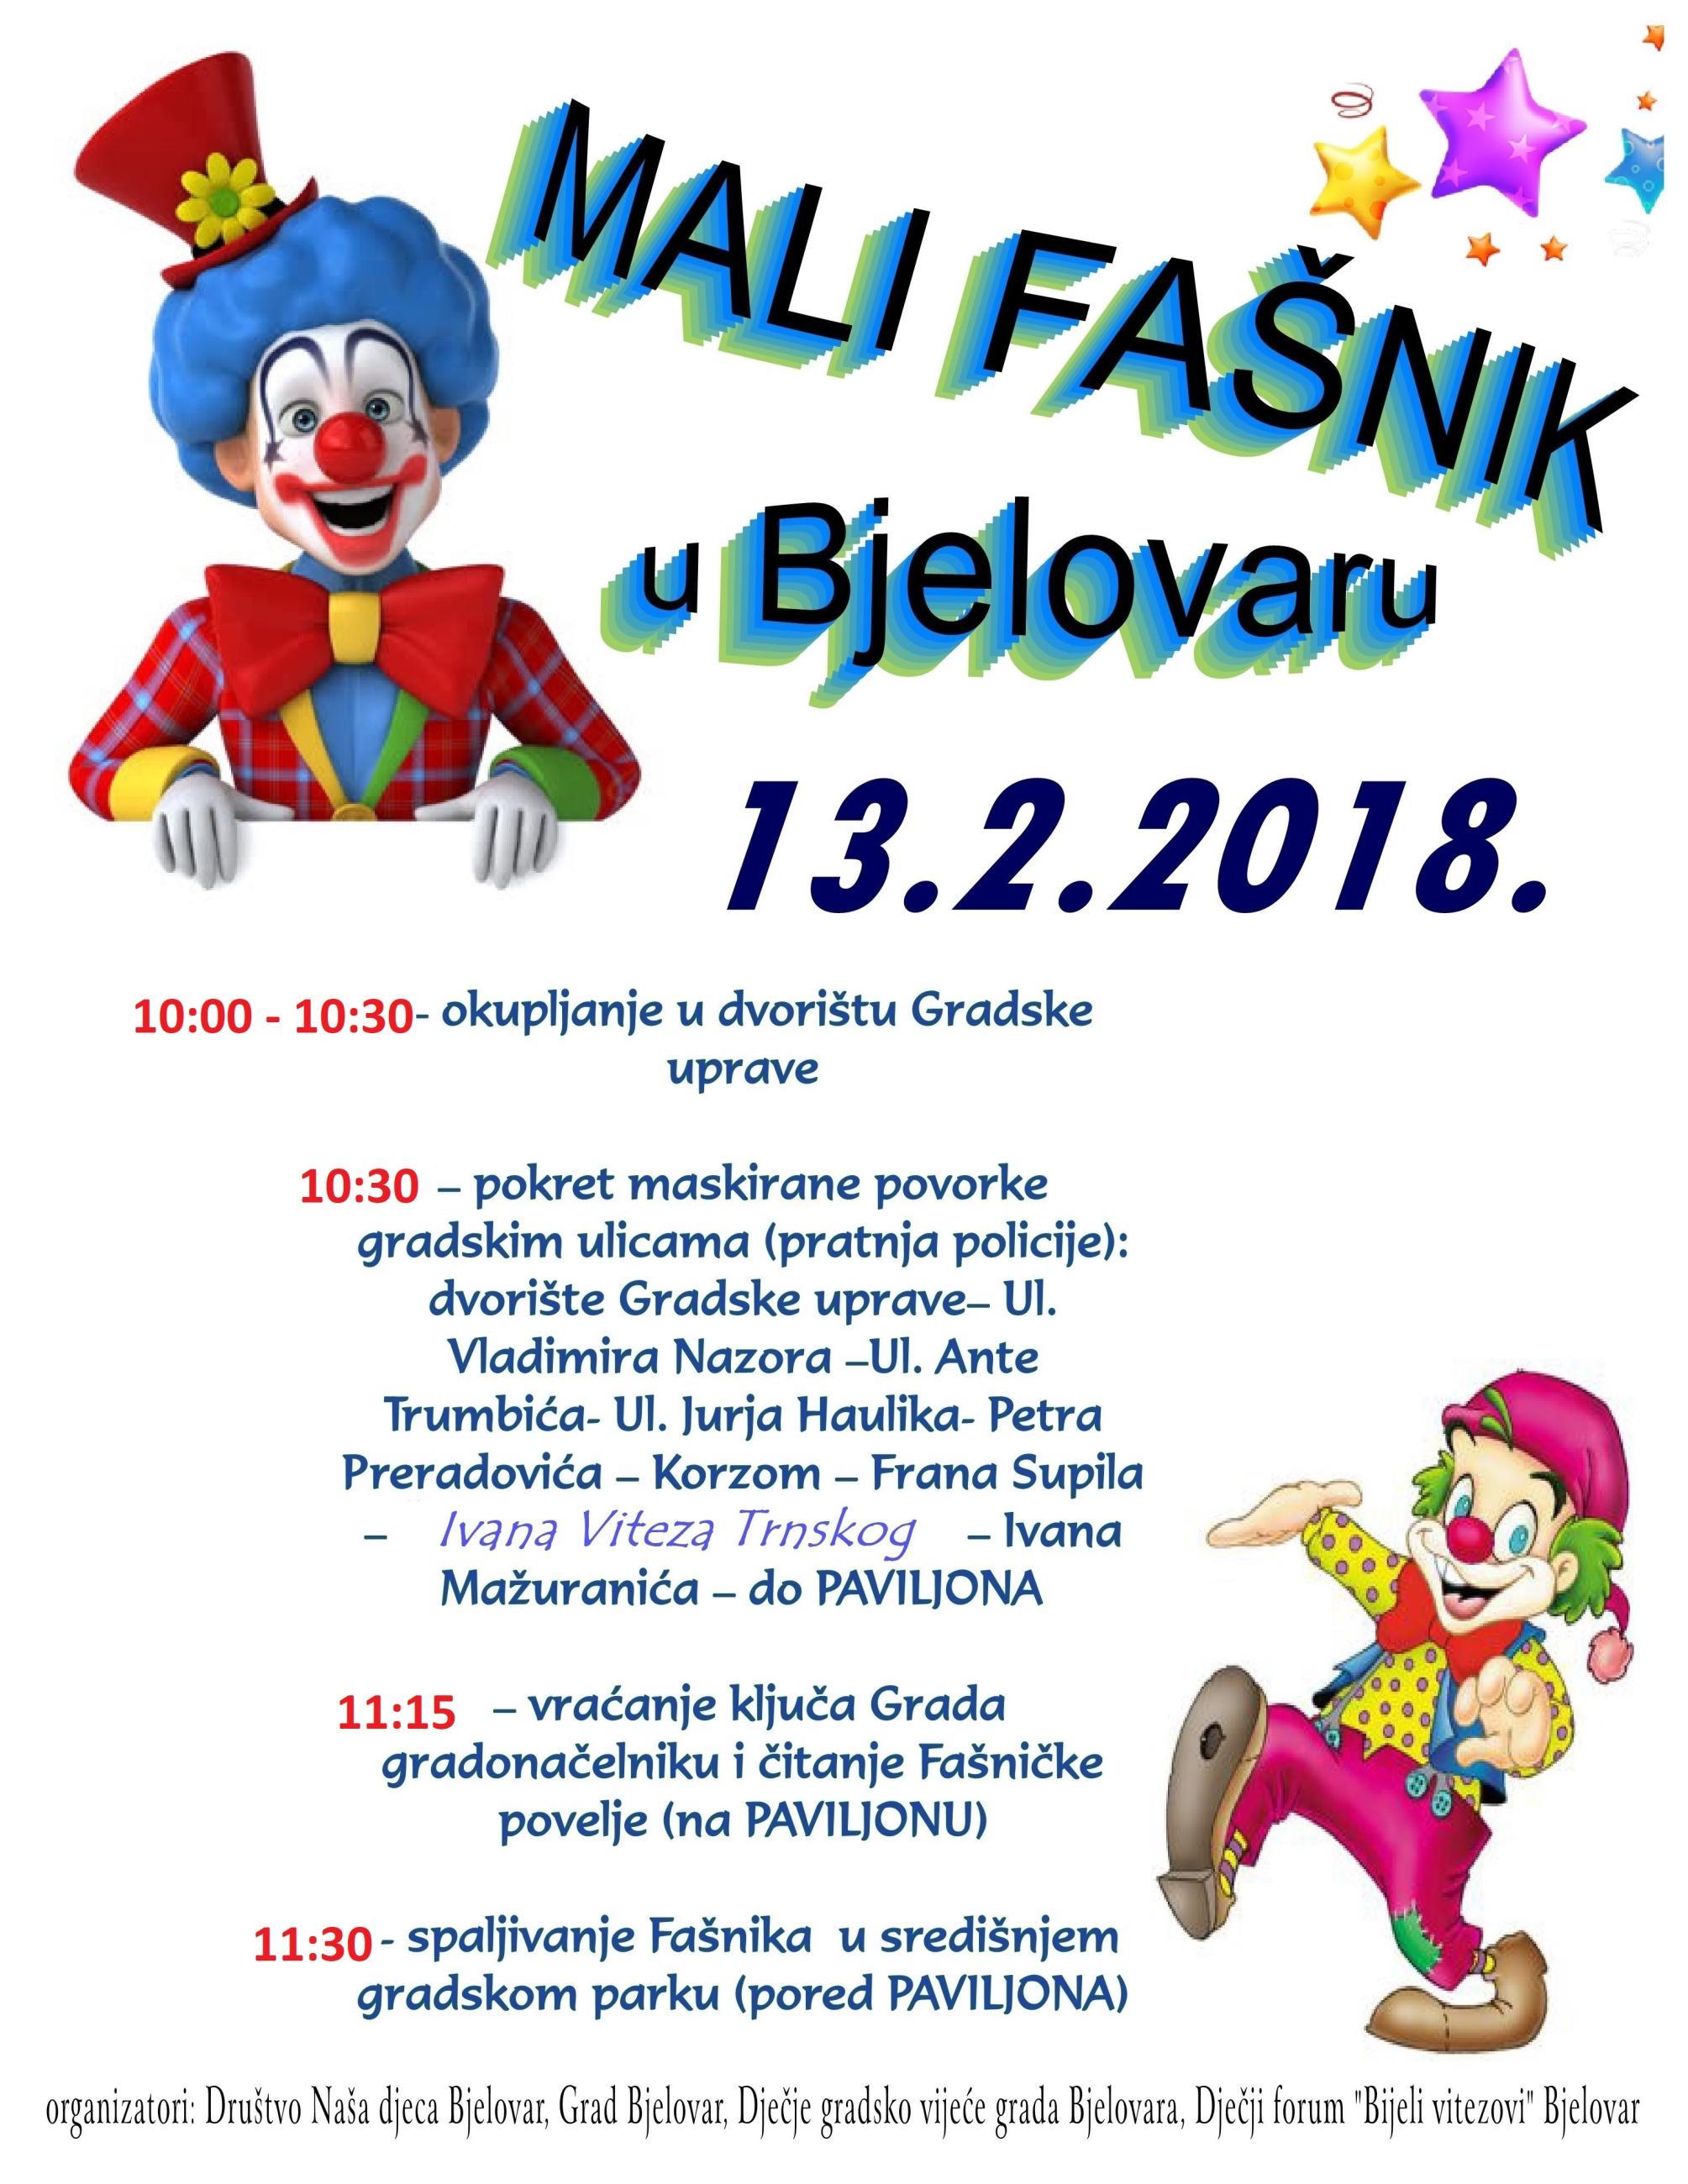 Mali Fašnik u Bjelovaru, 13.2.2018.